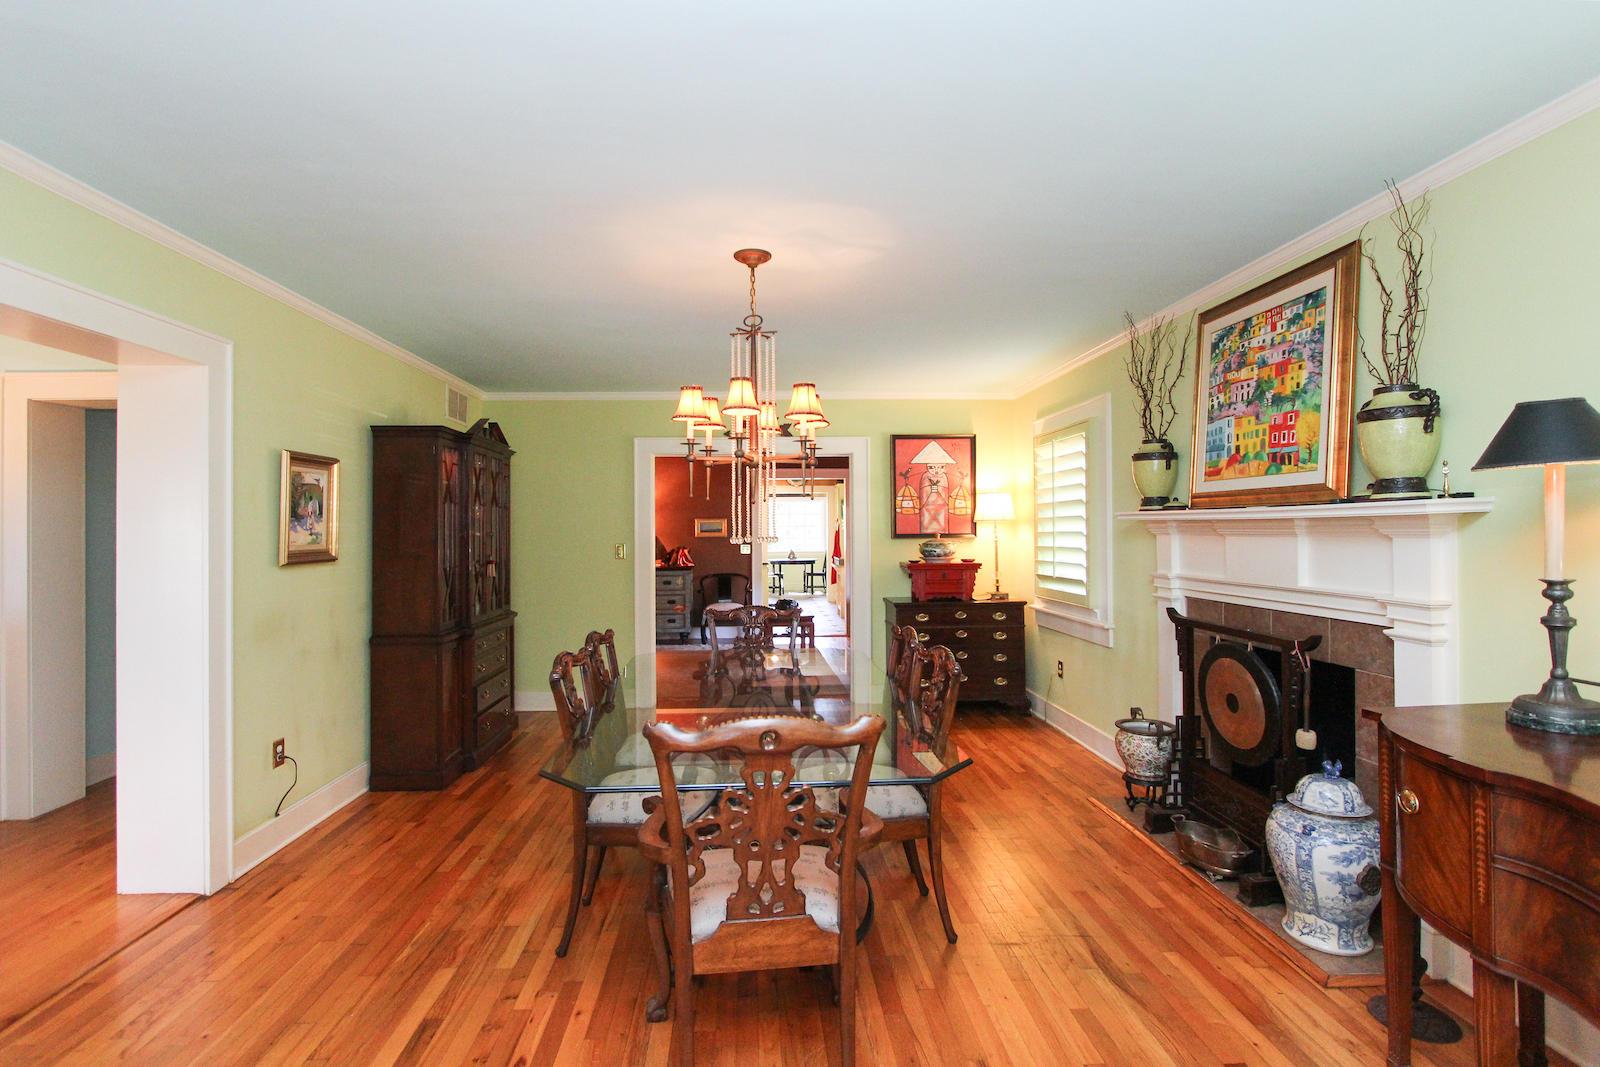 Albemarle Point Homes For Sale - 3 Albemarle, Charleston, SC - 25